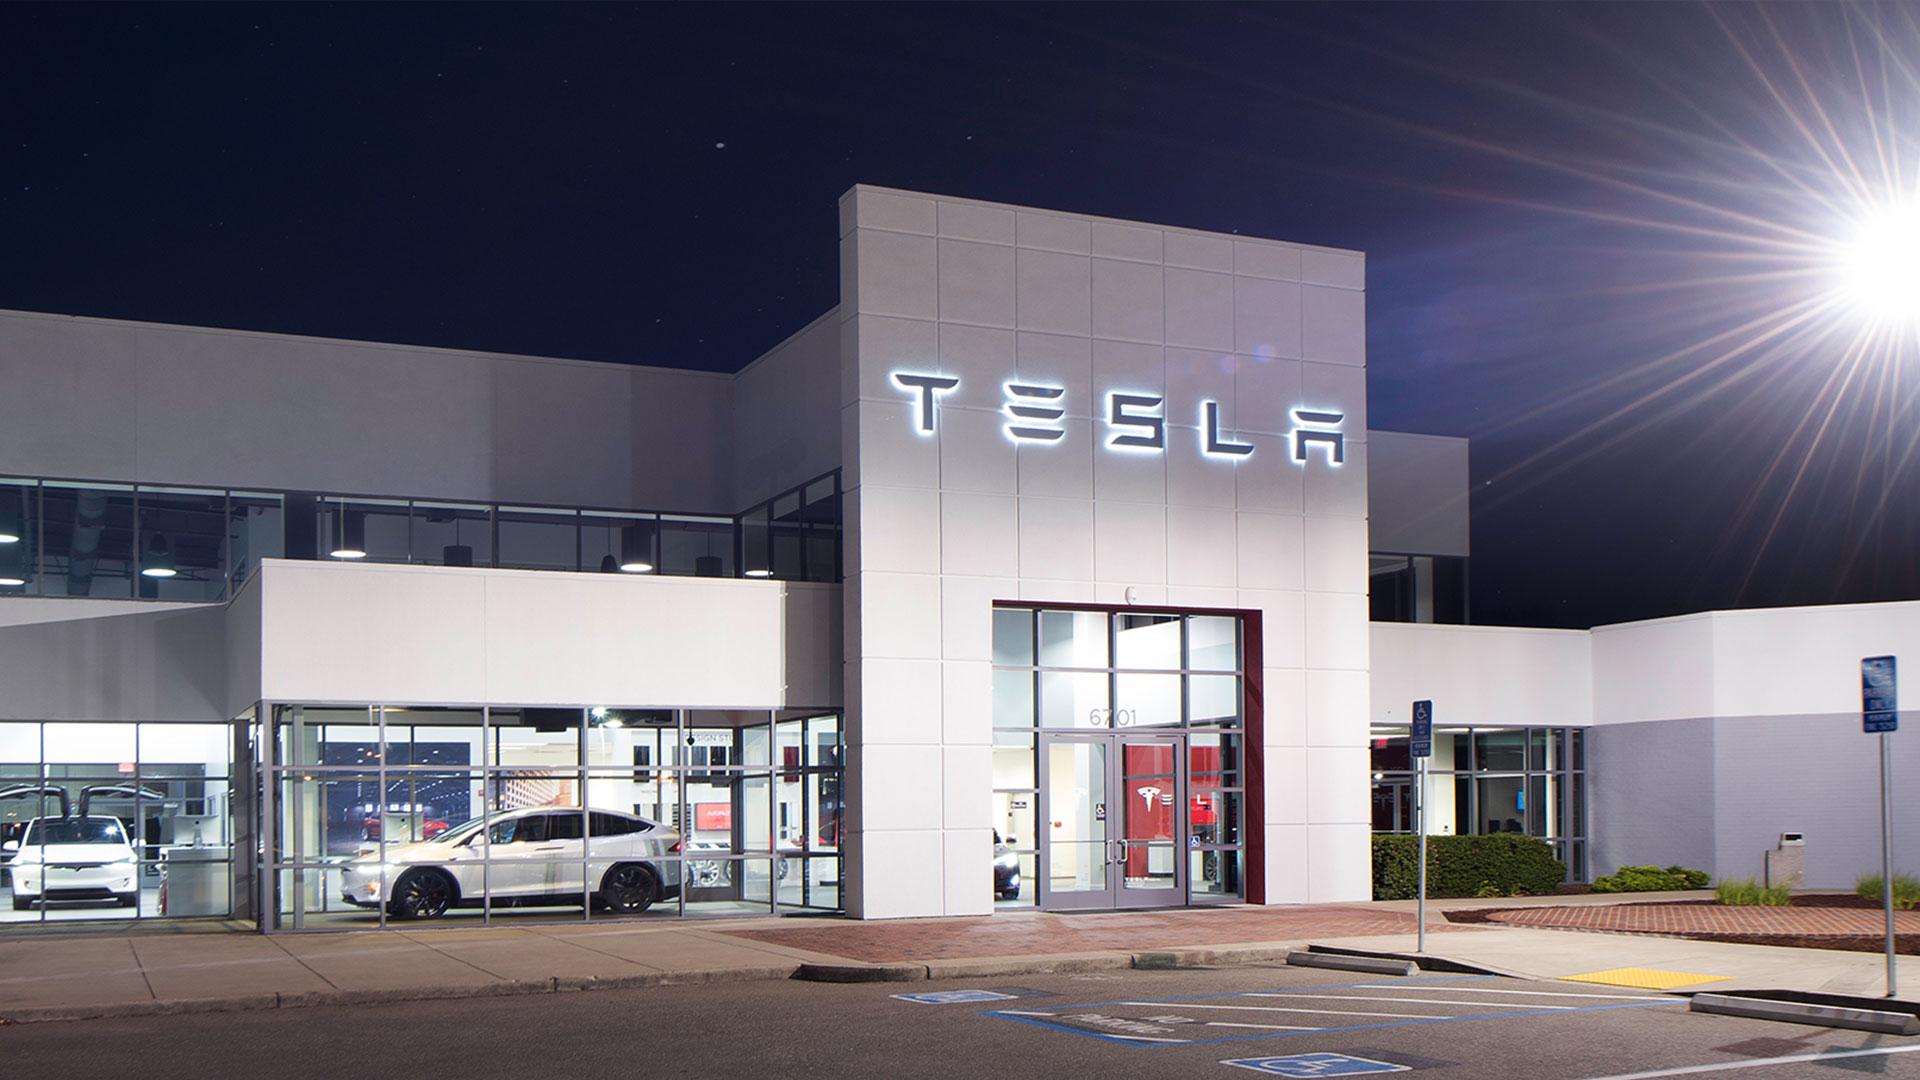 Tesla jetzt mit Raketenantrieb